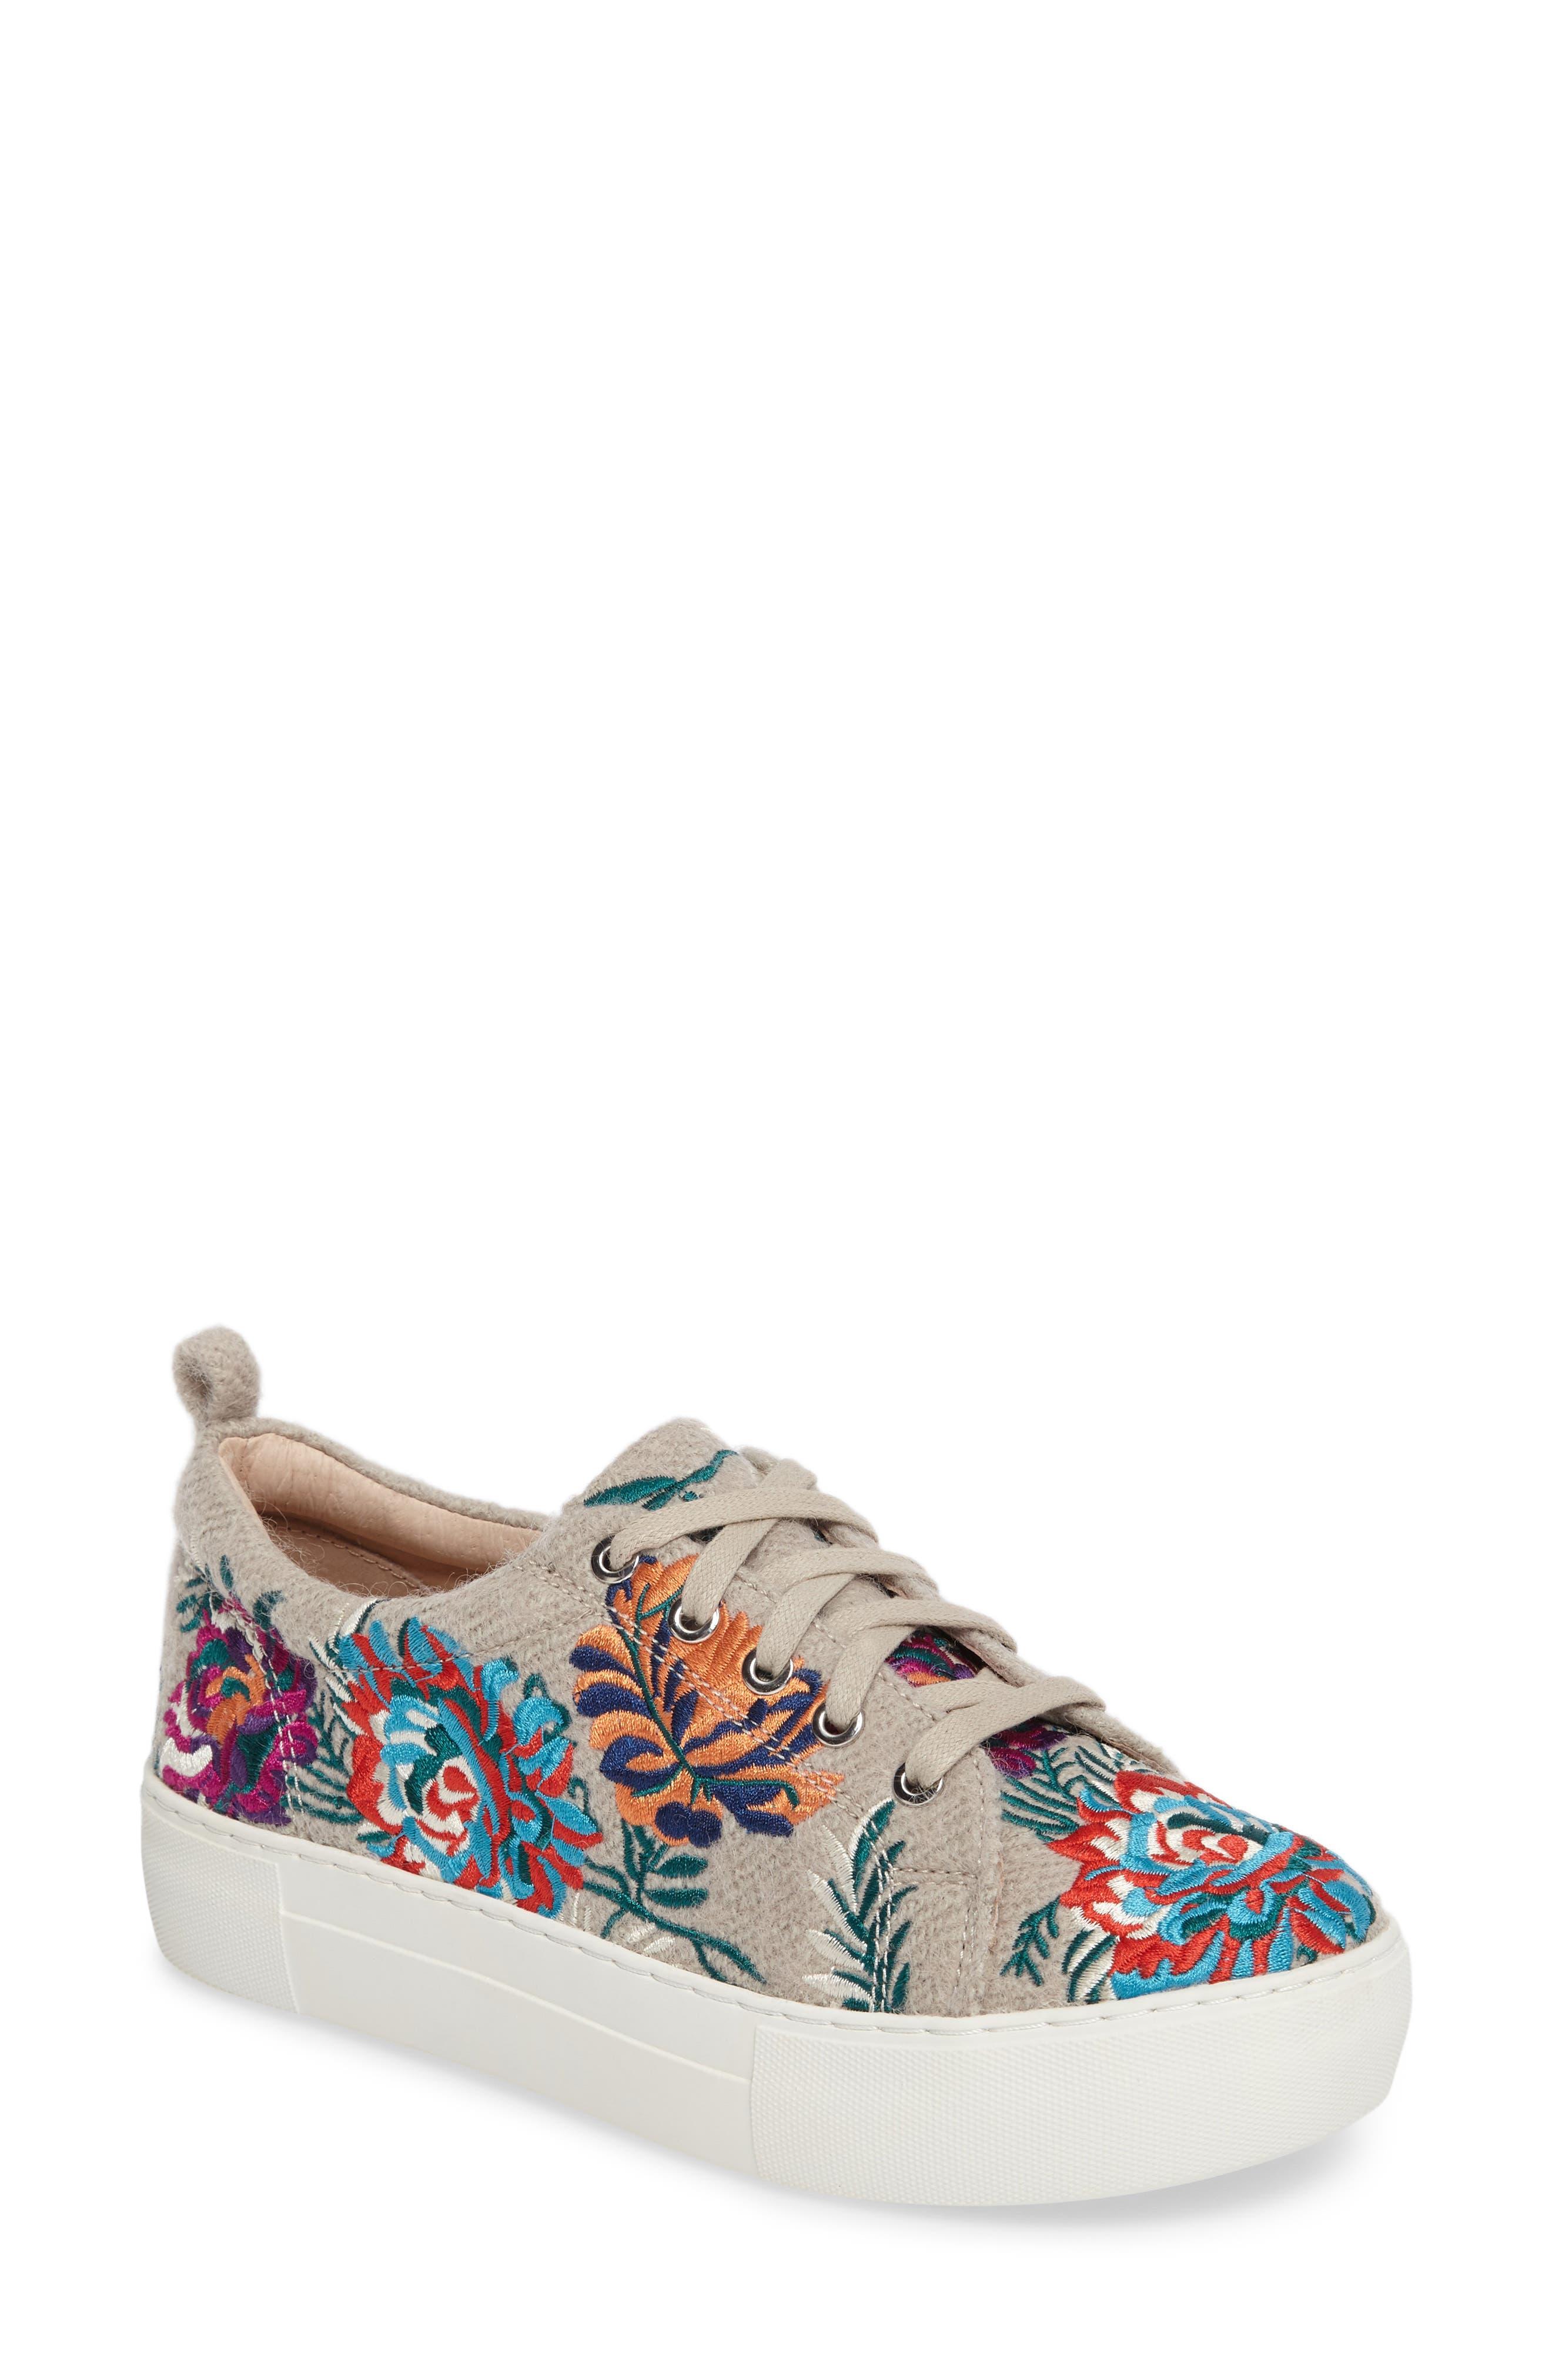 JSlides Aprie Embroidered Sneaker (Women)